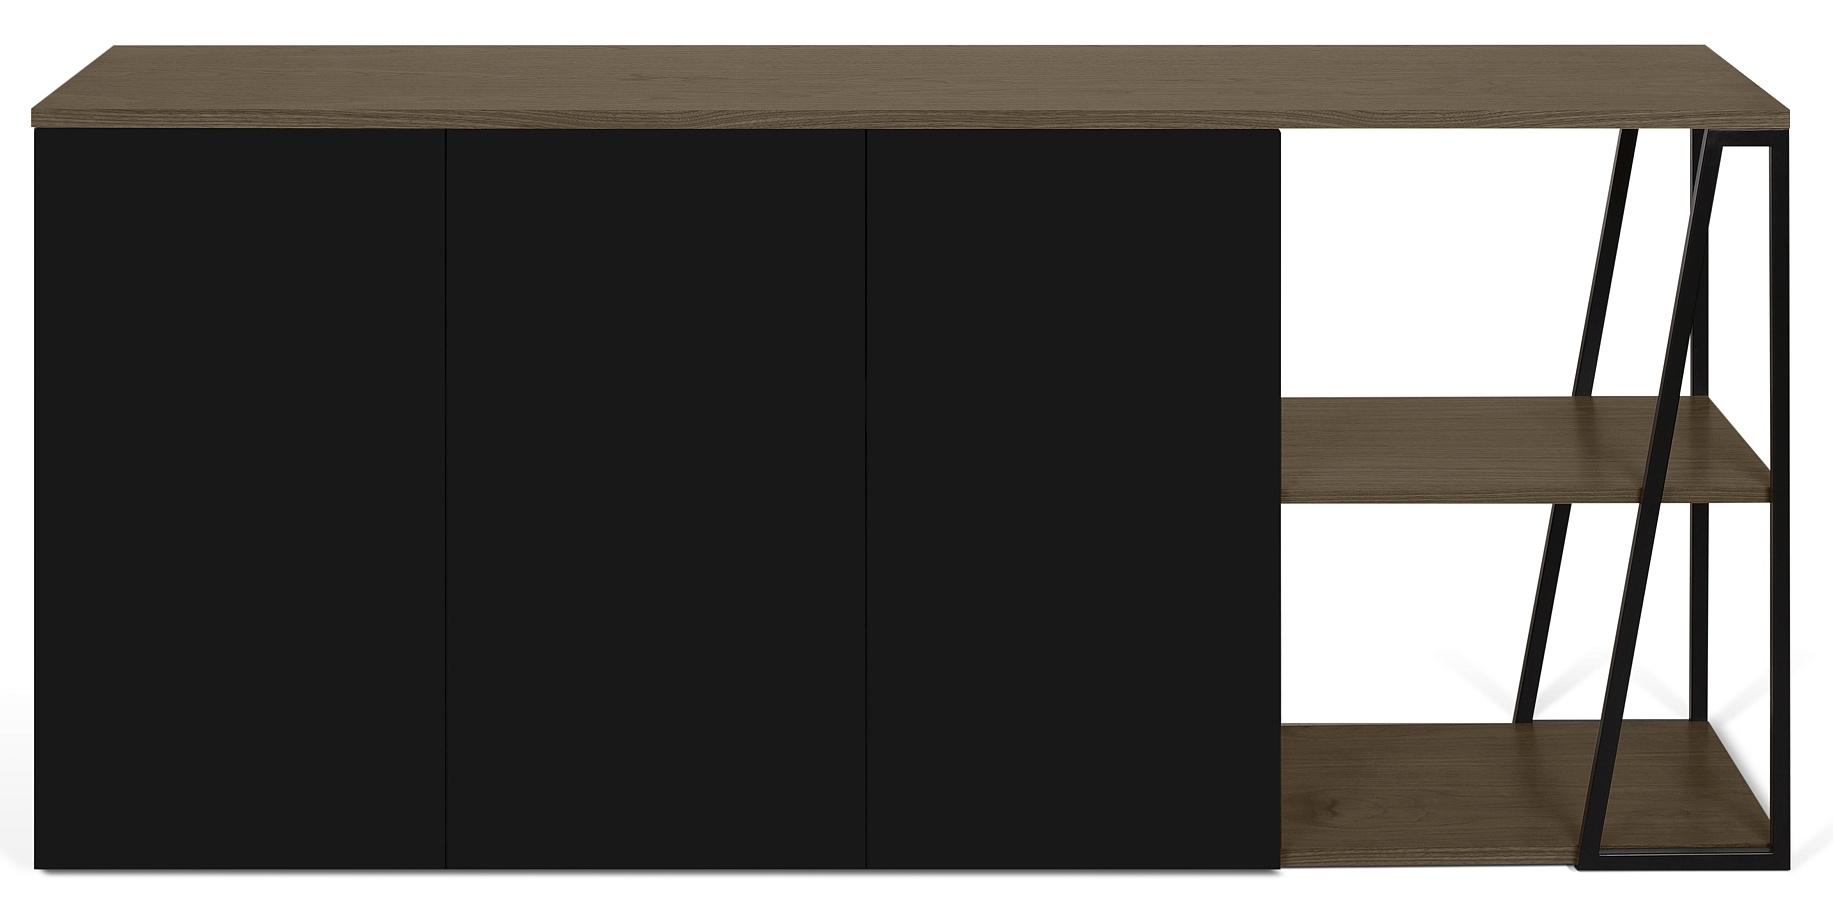 TemaHome Albi Dressoir 3-Deurs - B190xD45xH81 - Zwart Metaal - Walnoot